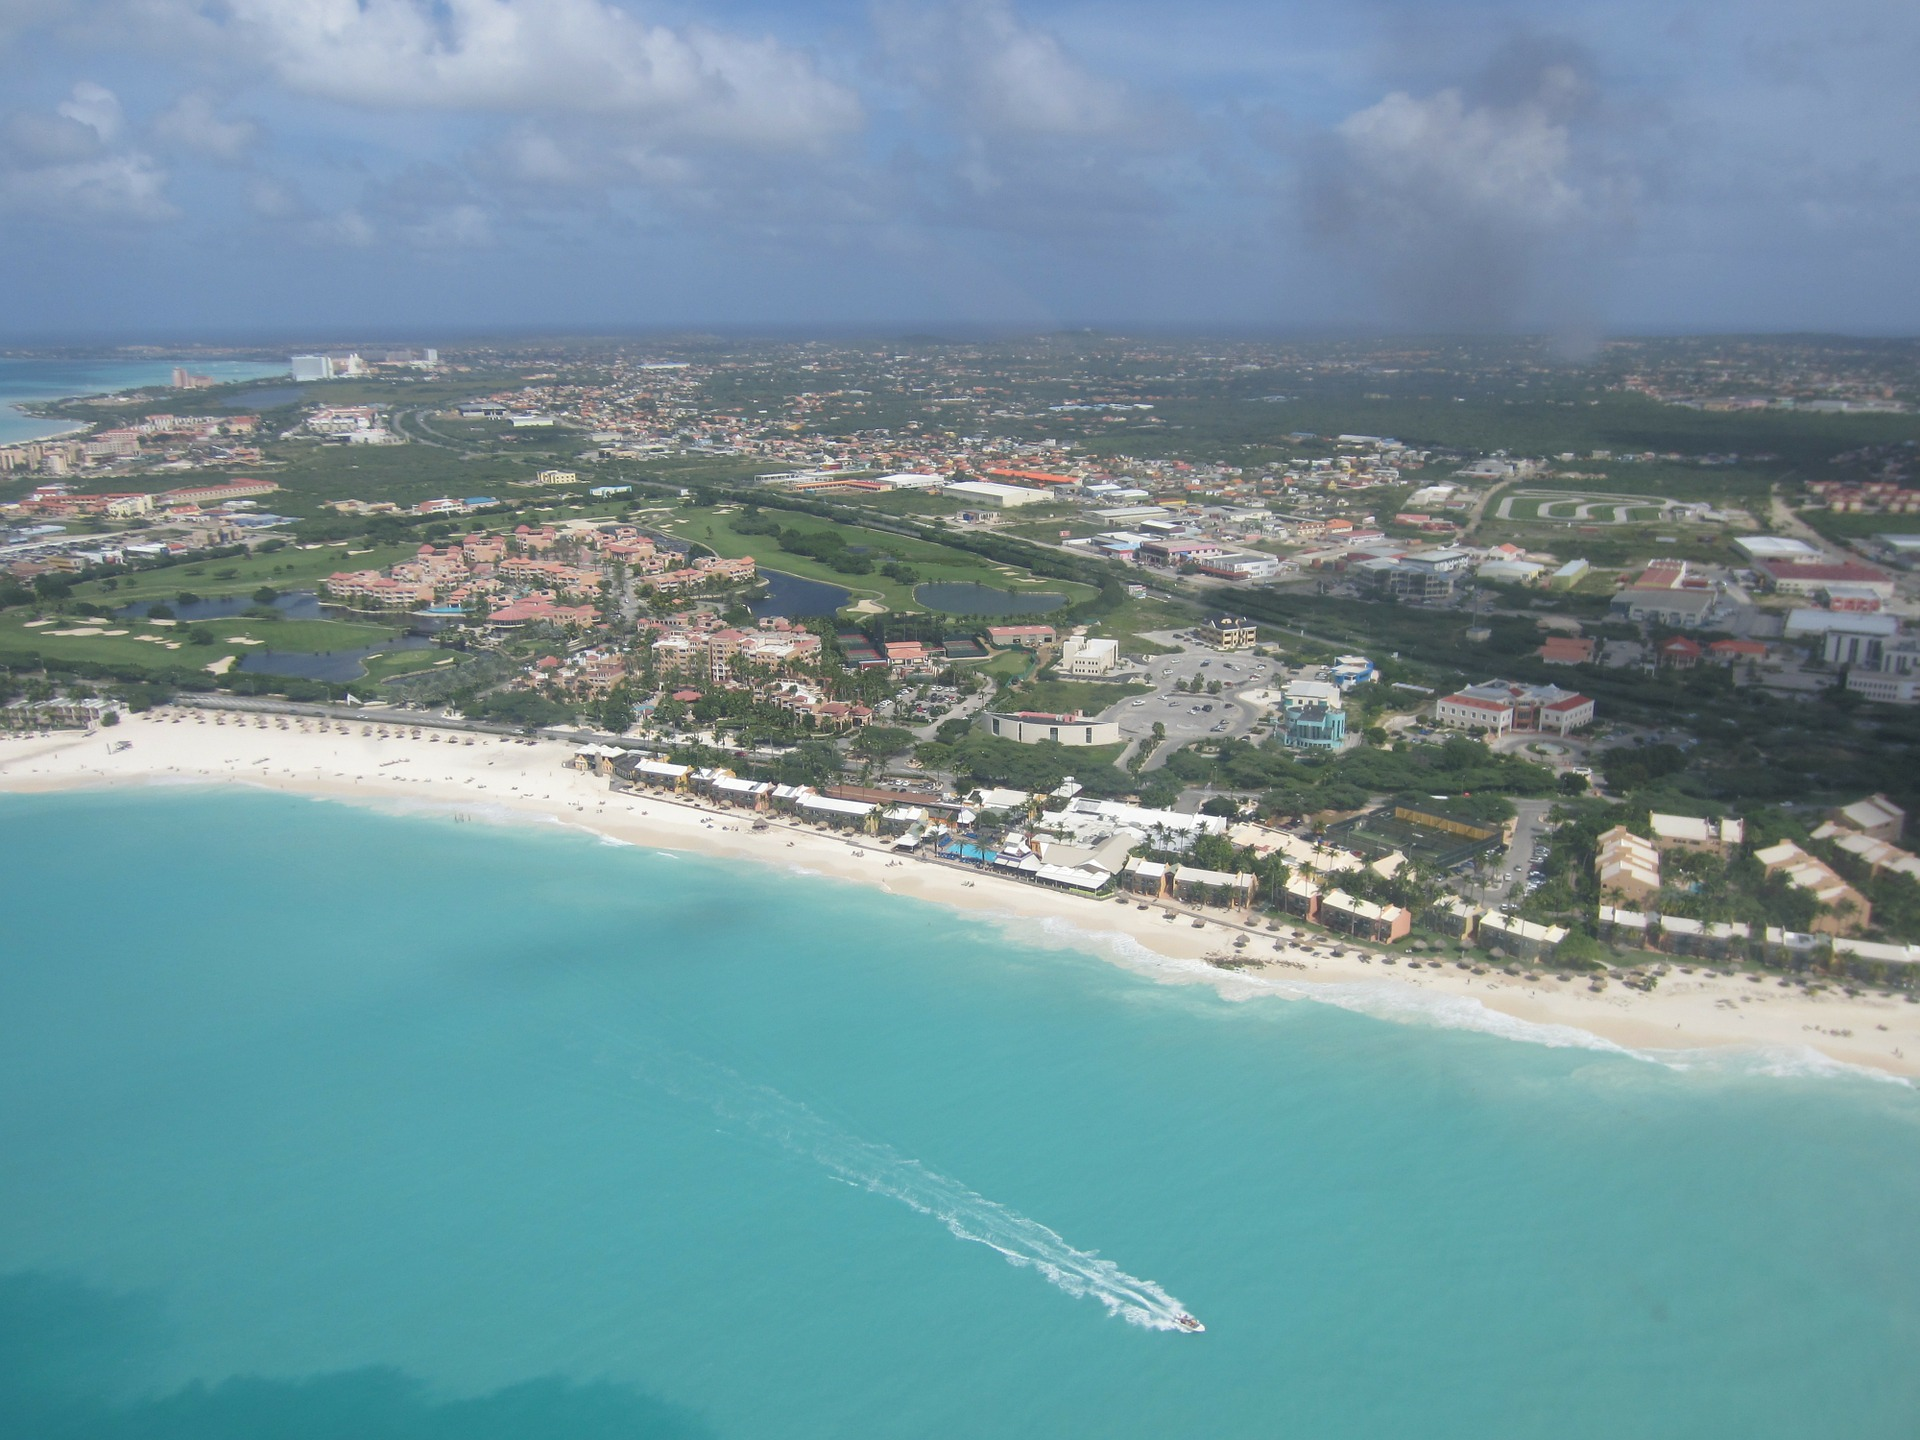 Aerial view of beach in Aruba